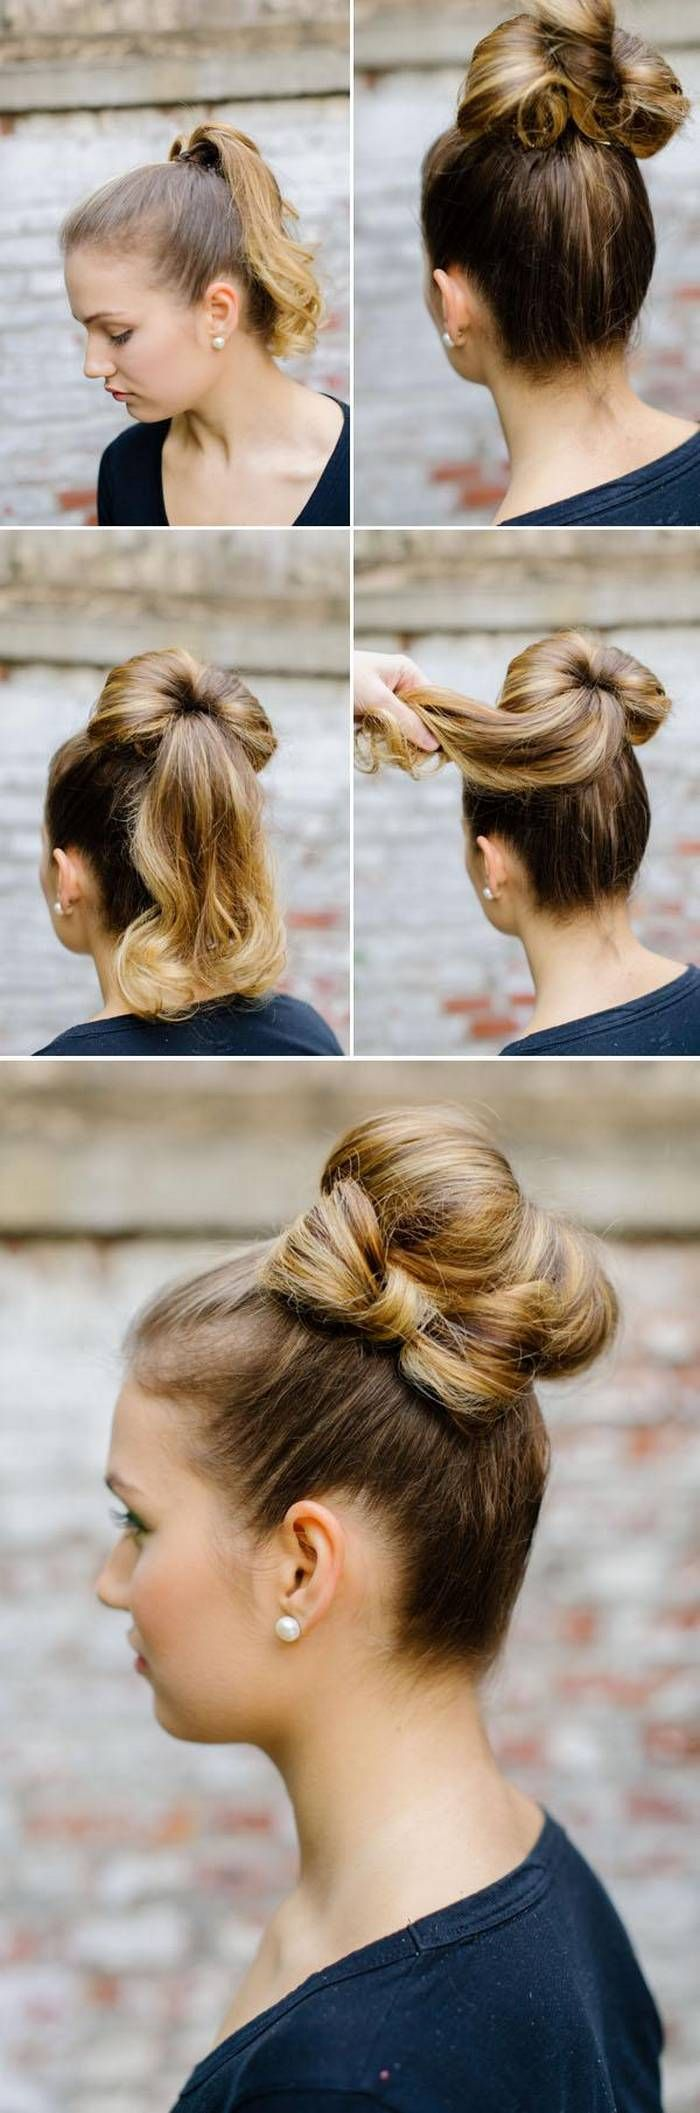 Straightforward tenminutes hair tutorials for active mornings